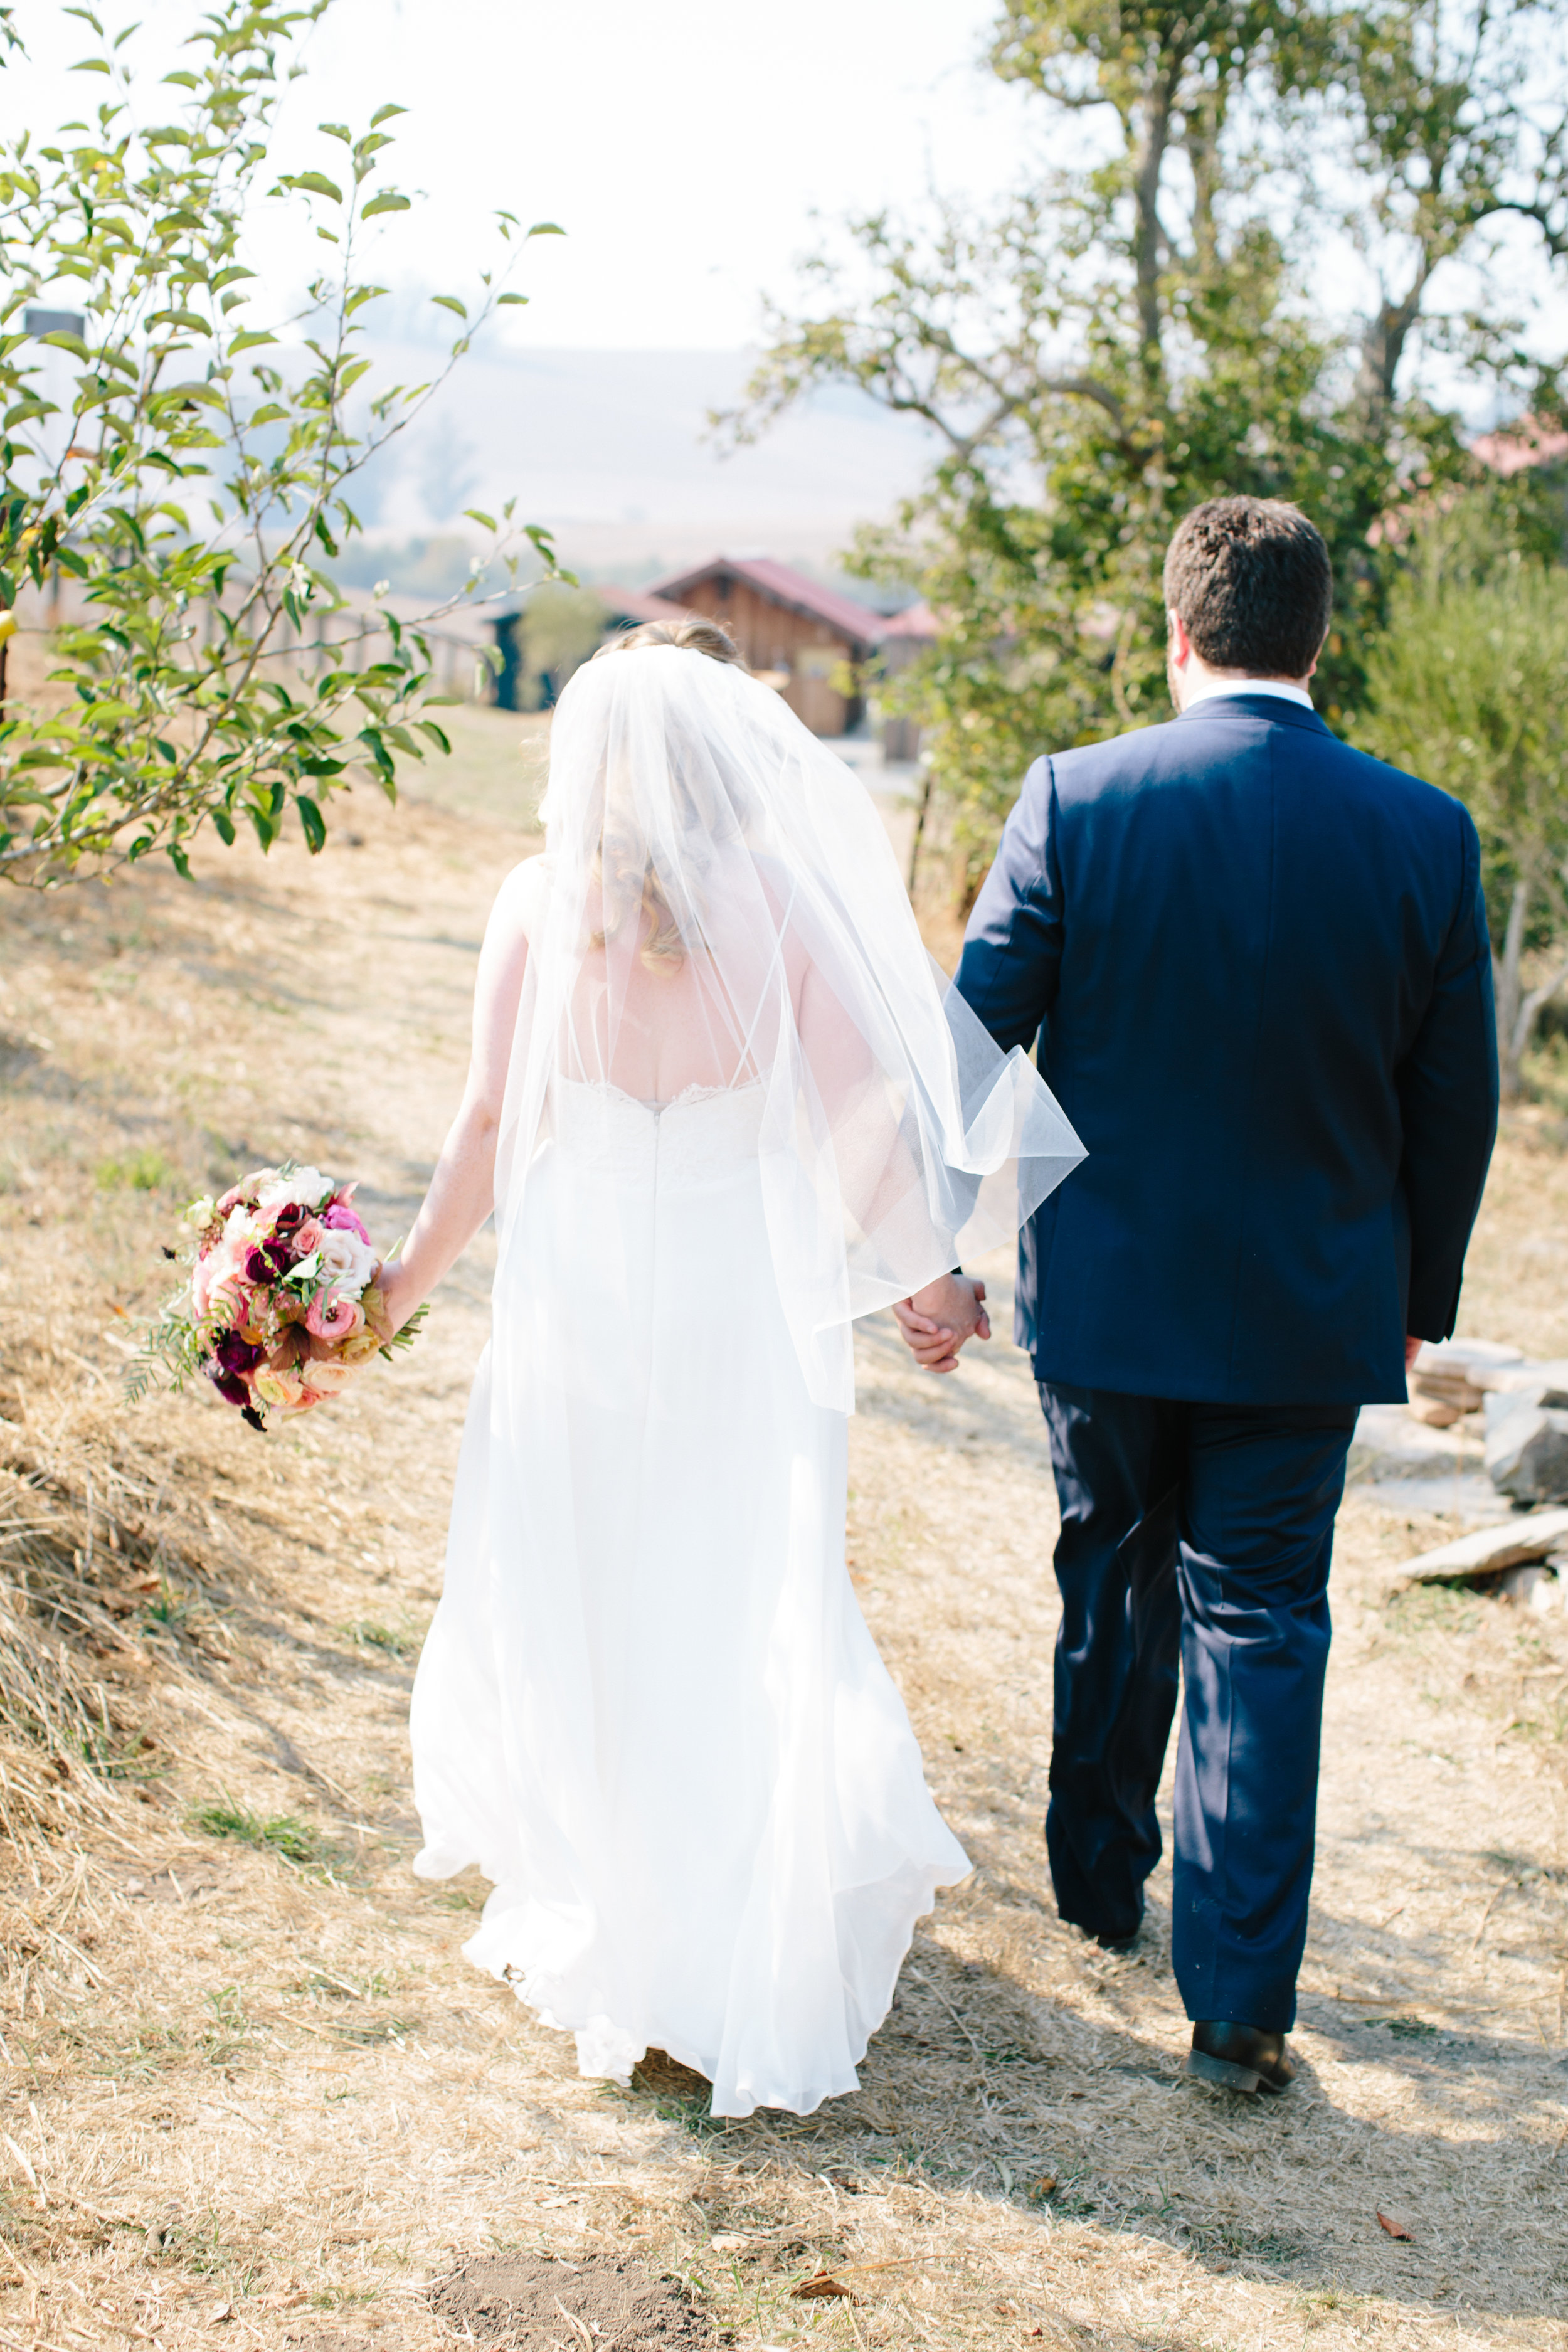 katie + Ben's autumn wedding | Petaluma | Olympias Valley Estate | Sonya Yruel.jpg